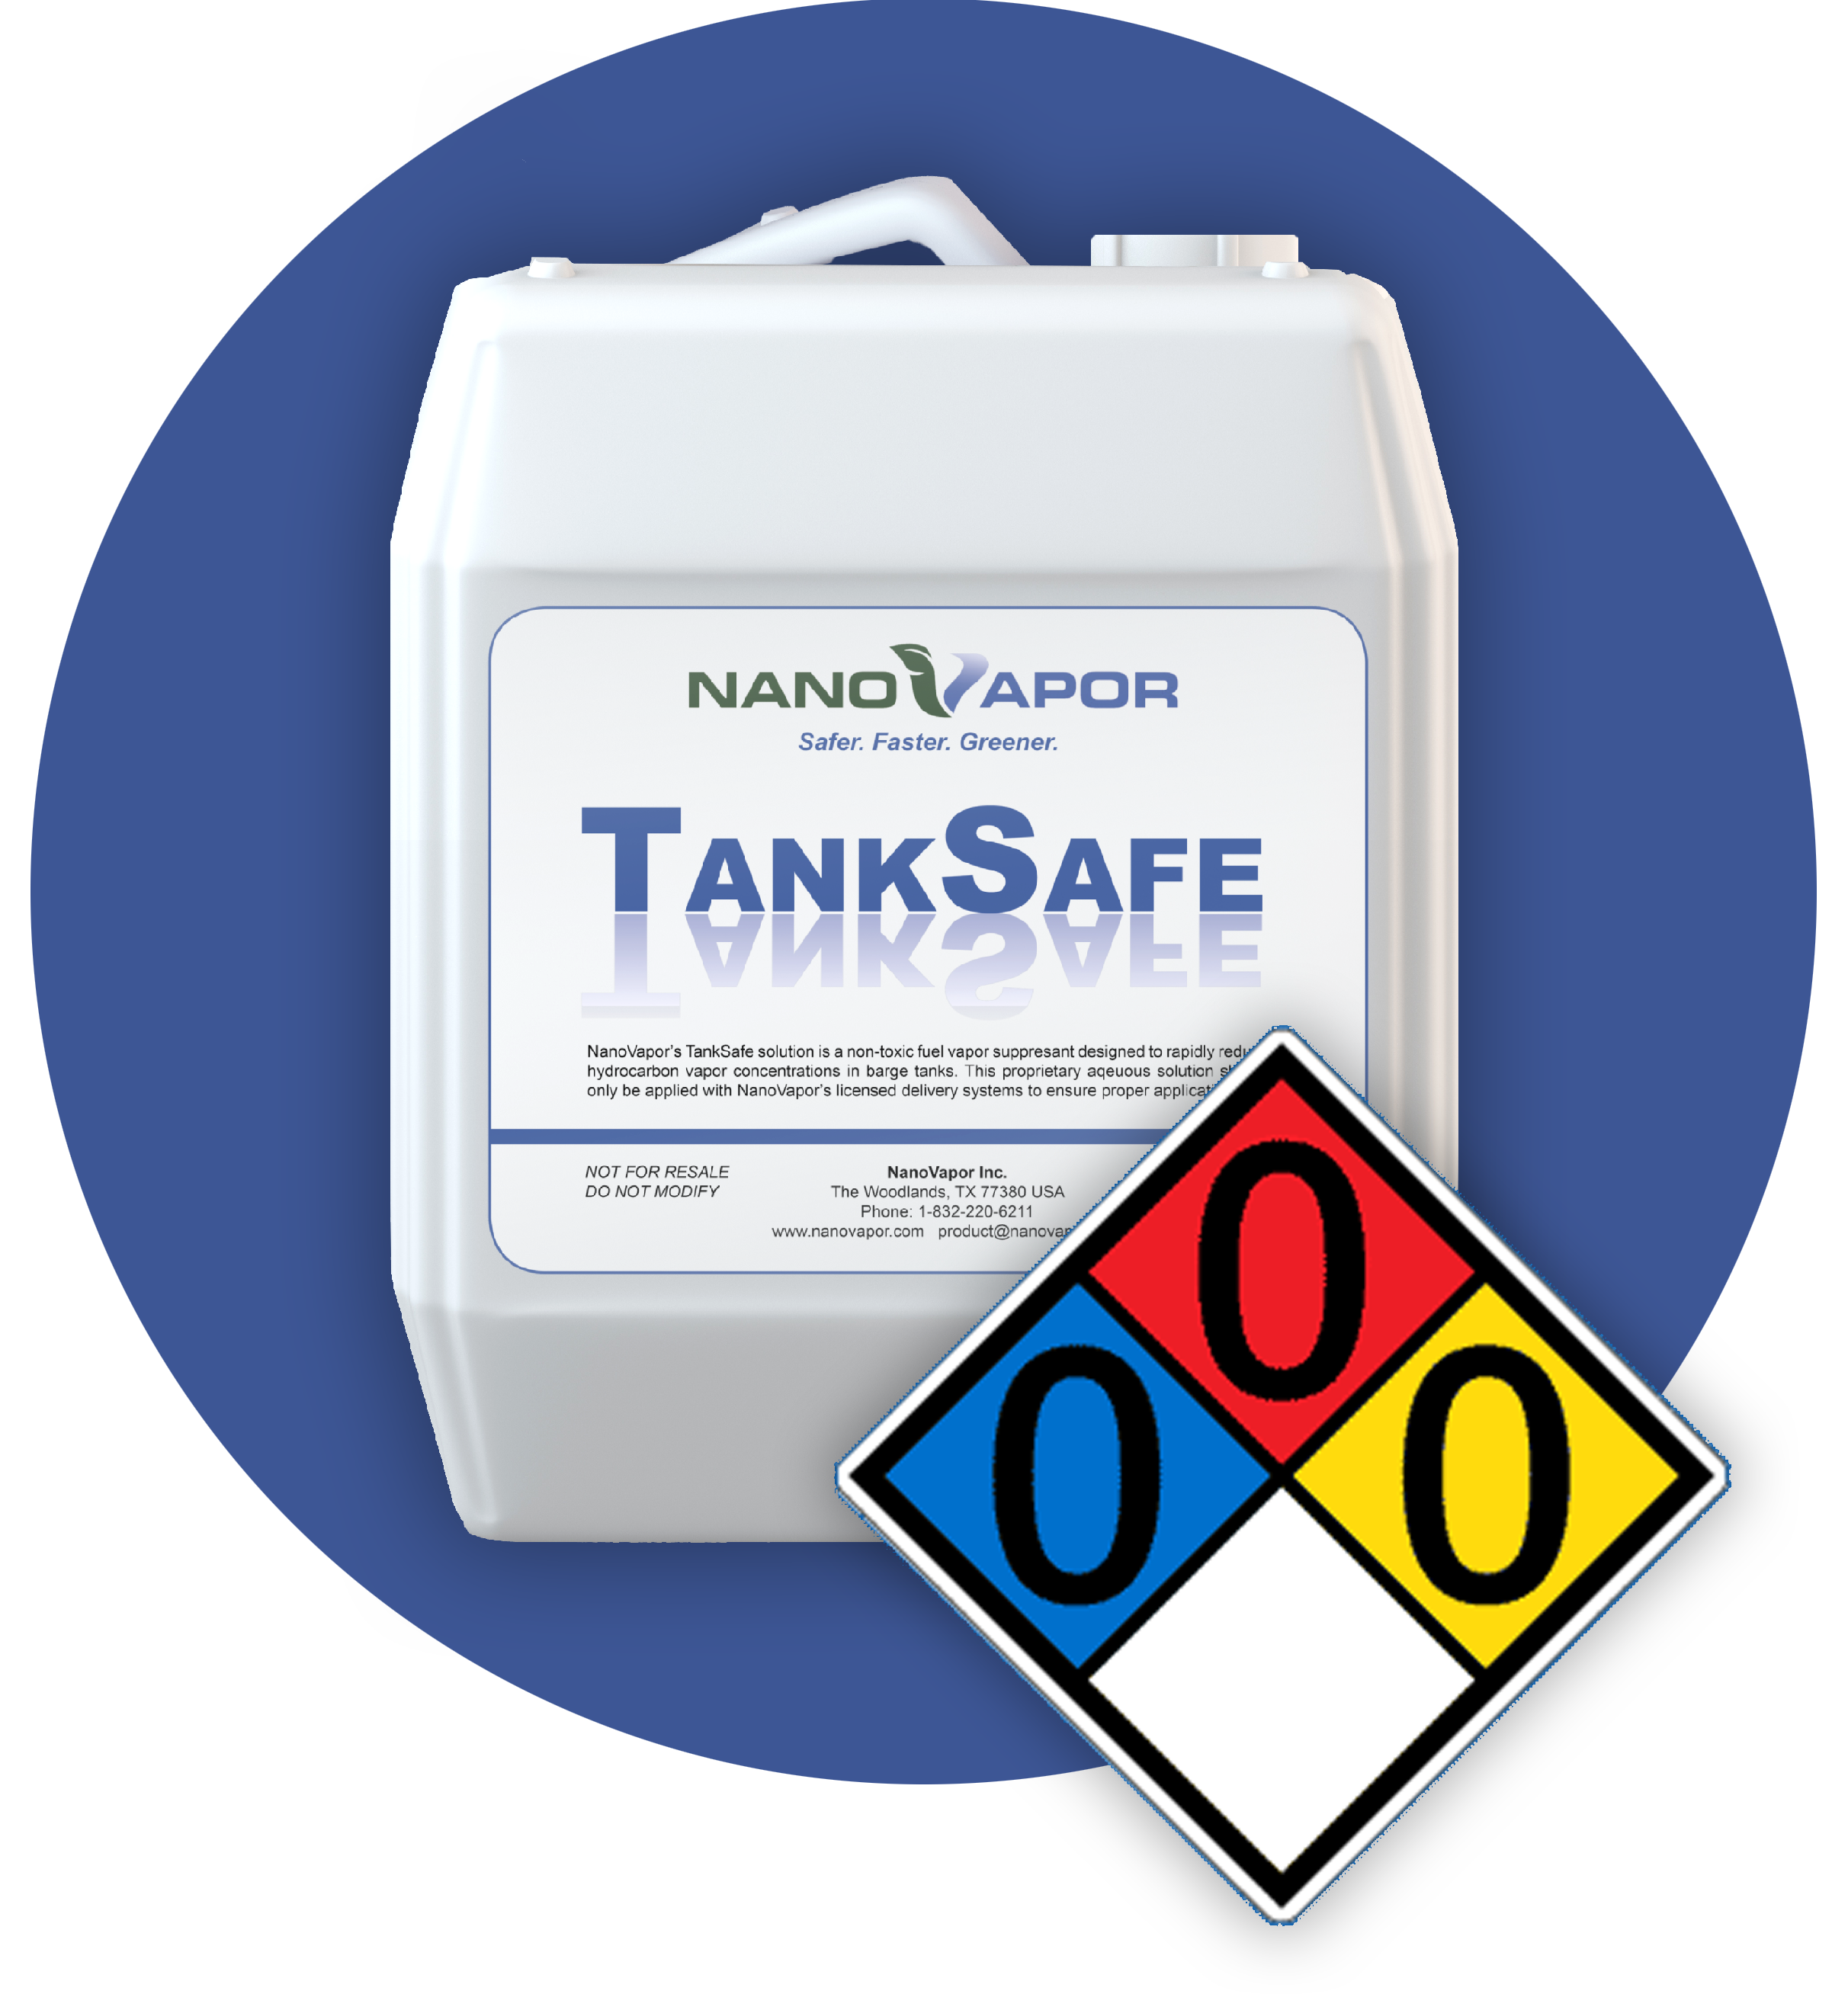 G_TankSafe_profile-bluecir-nfpa.png